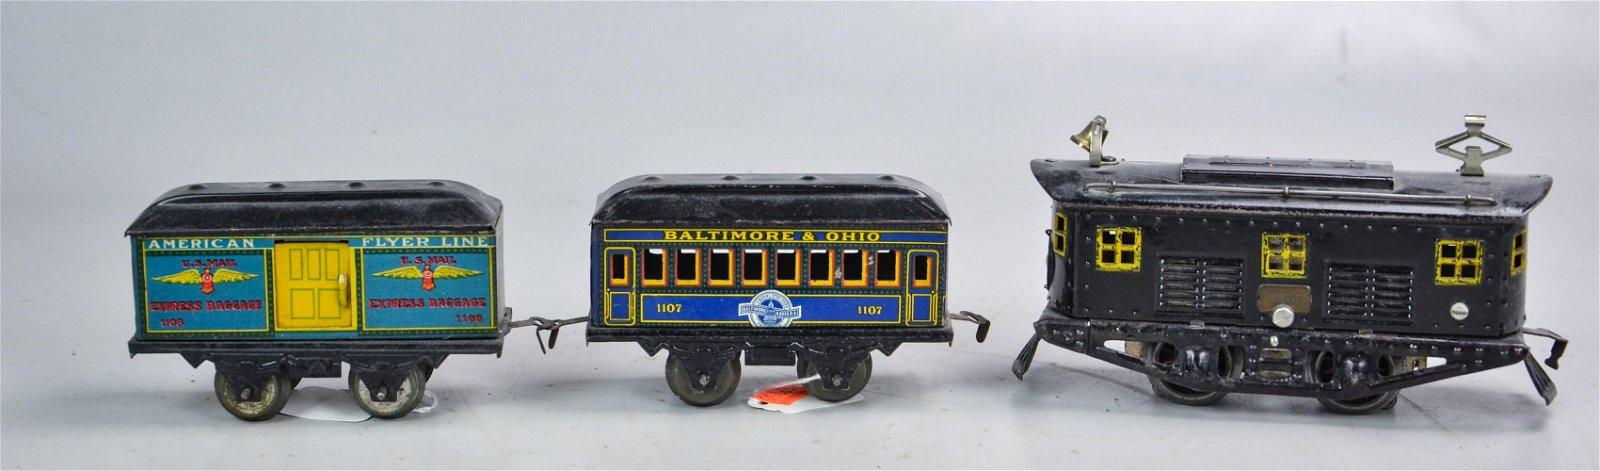 (3) American Flyer Train Cars